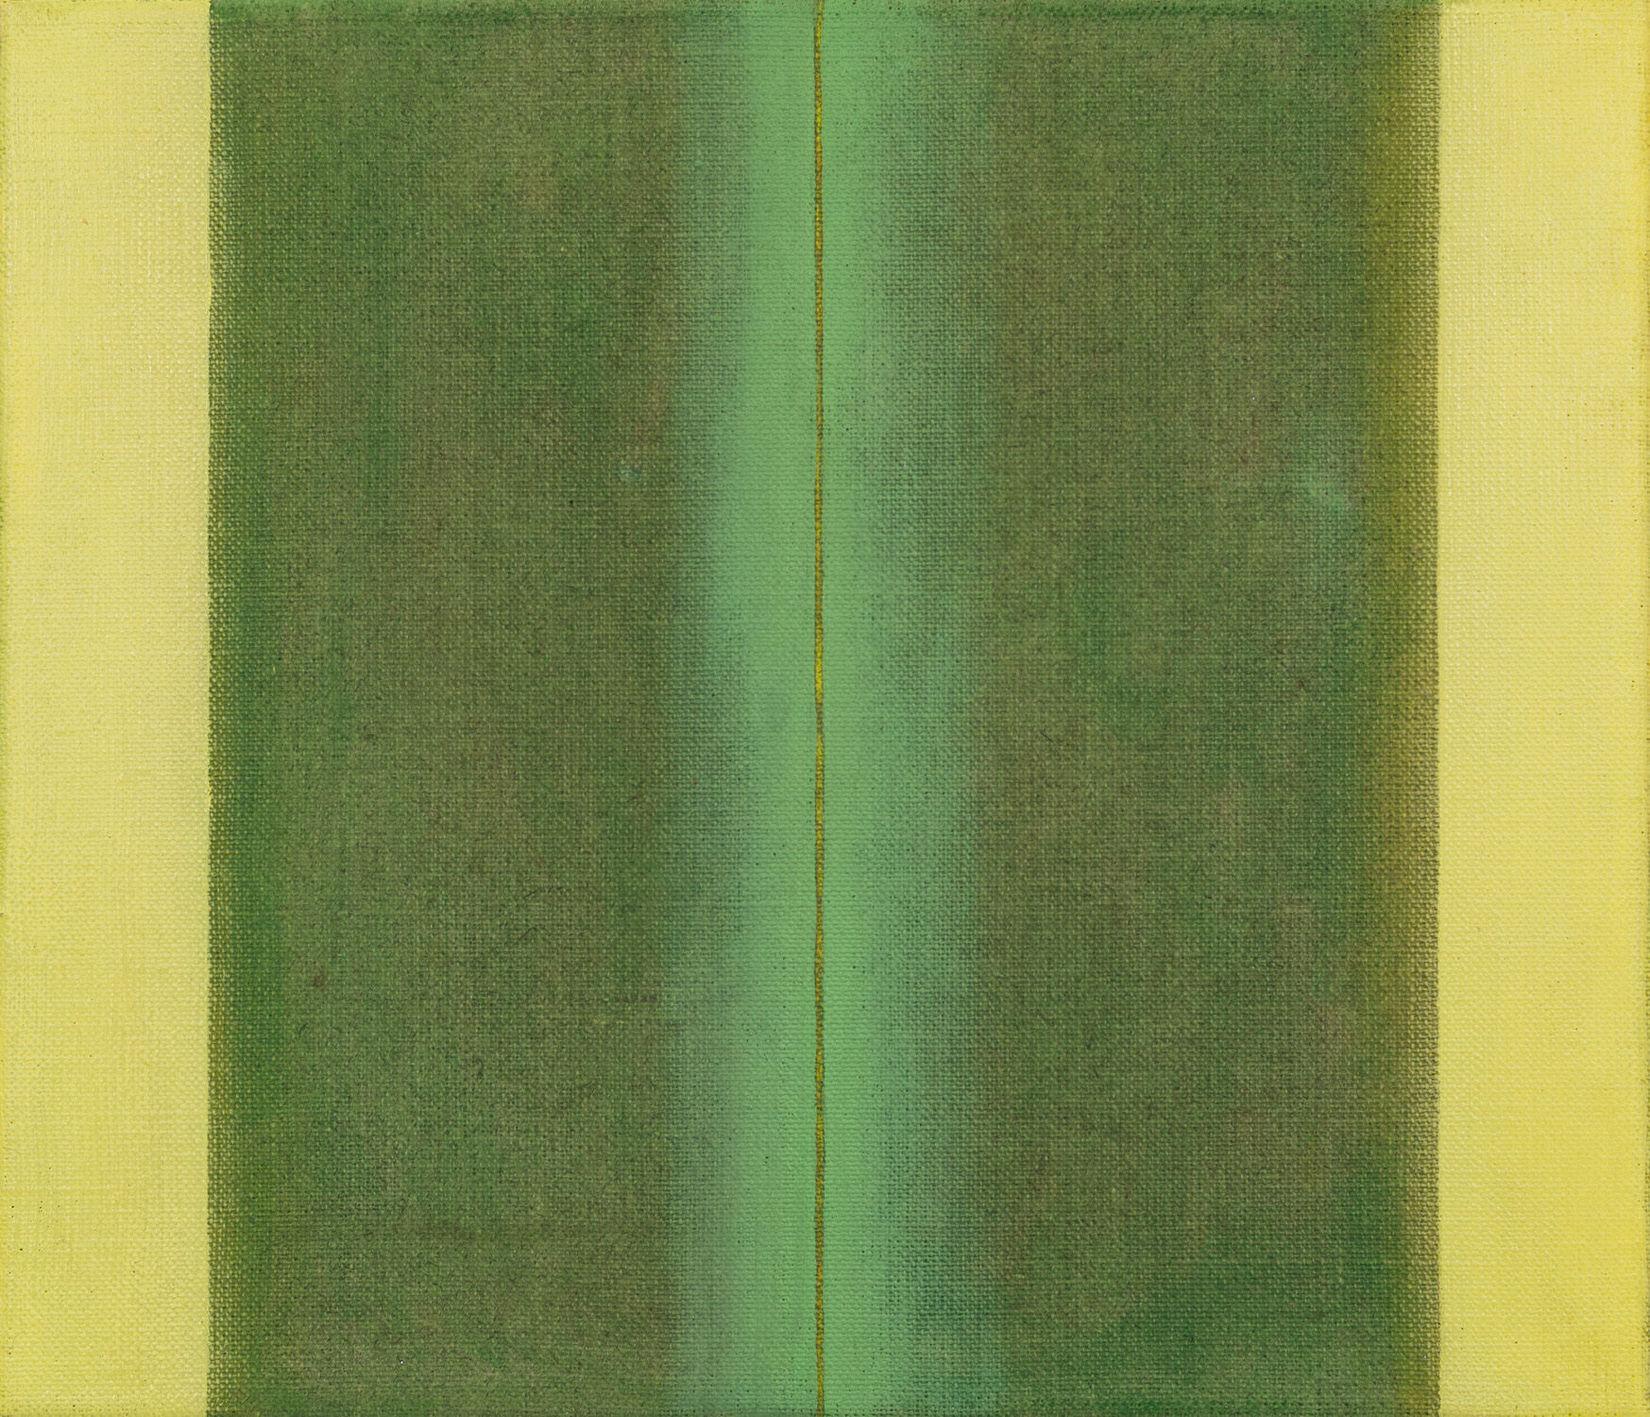 Artists to Follow if You Like Mark Rothko